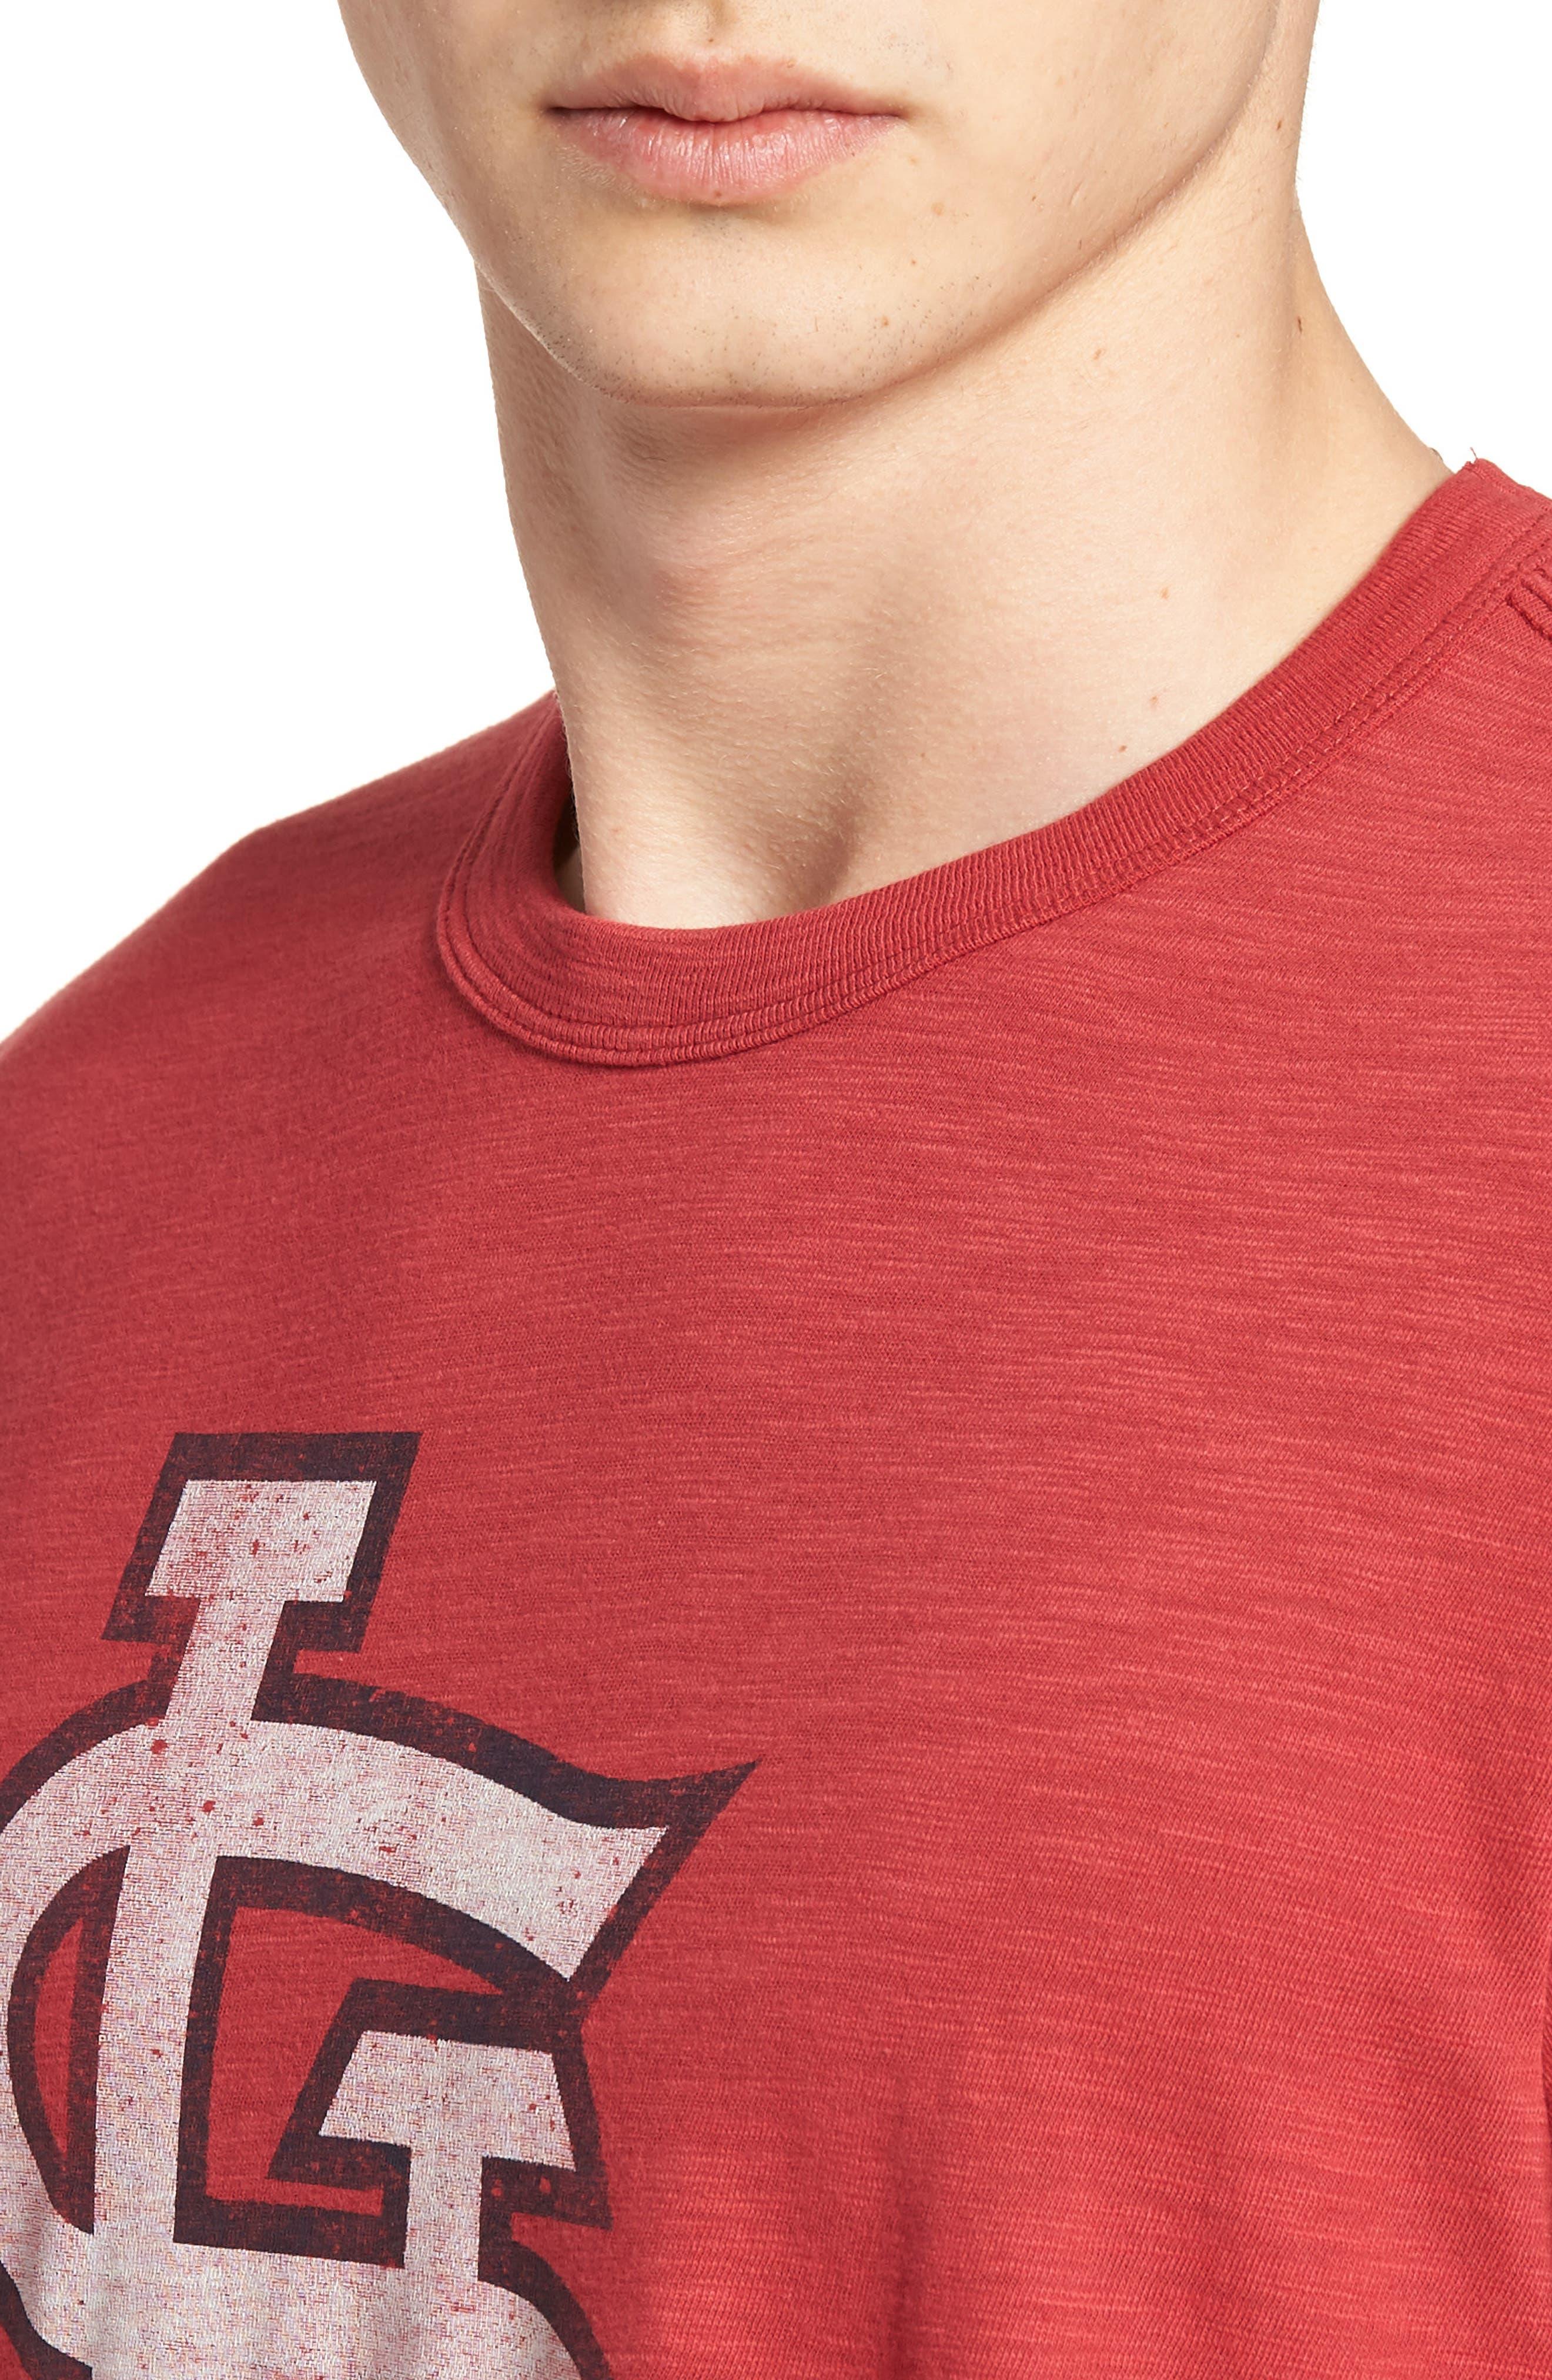 Grit Scrum St. Louis Cardinals T-Shirt,                             Alternate thumbnail 4, color,                             RESCUE RED